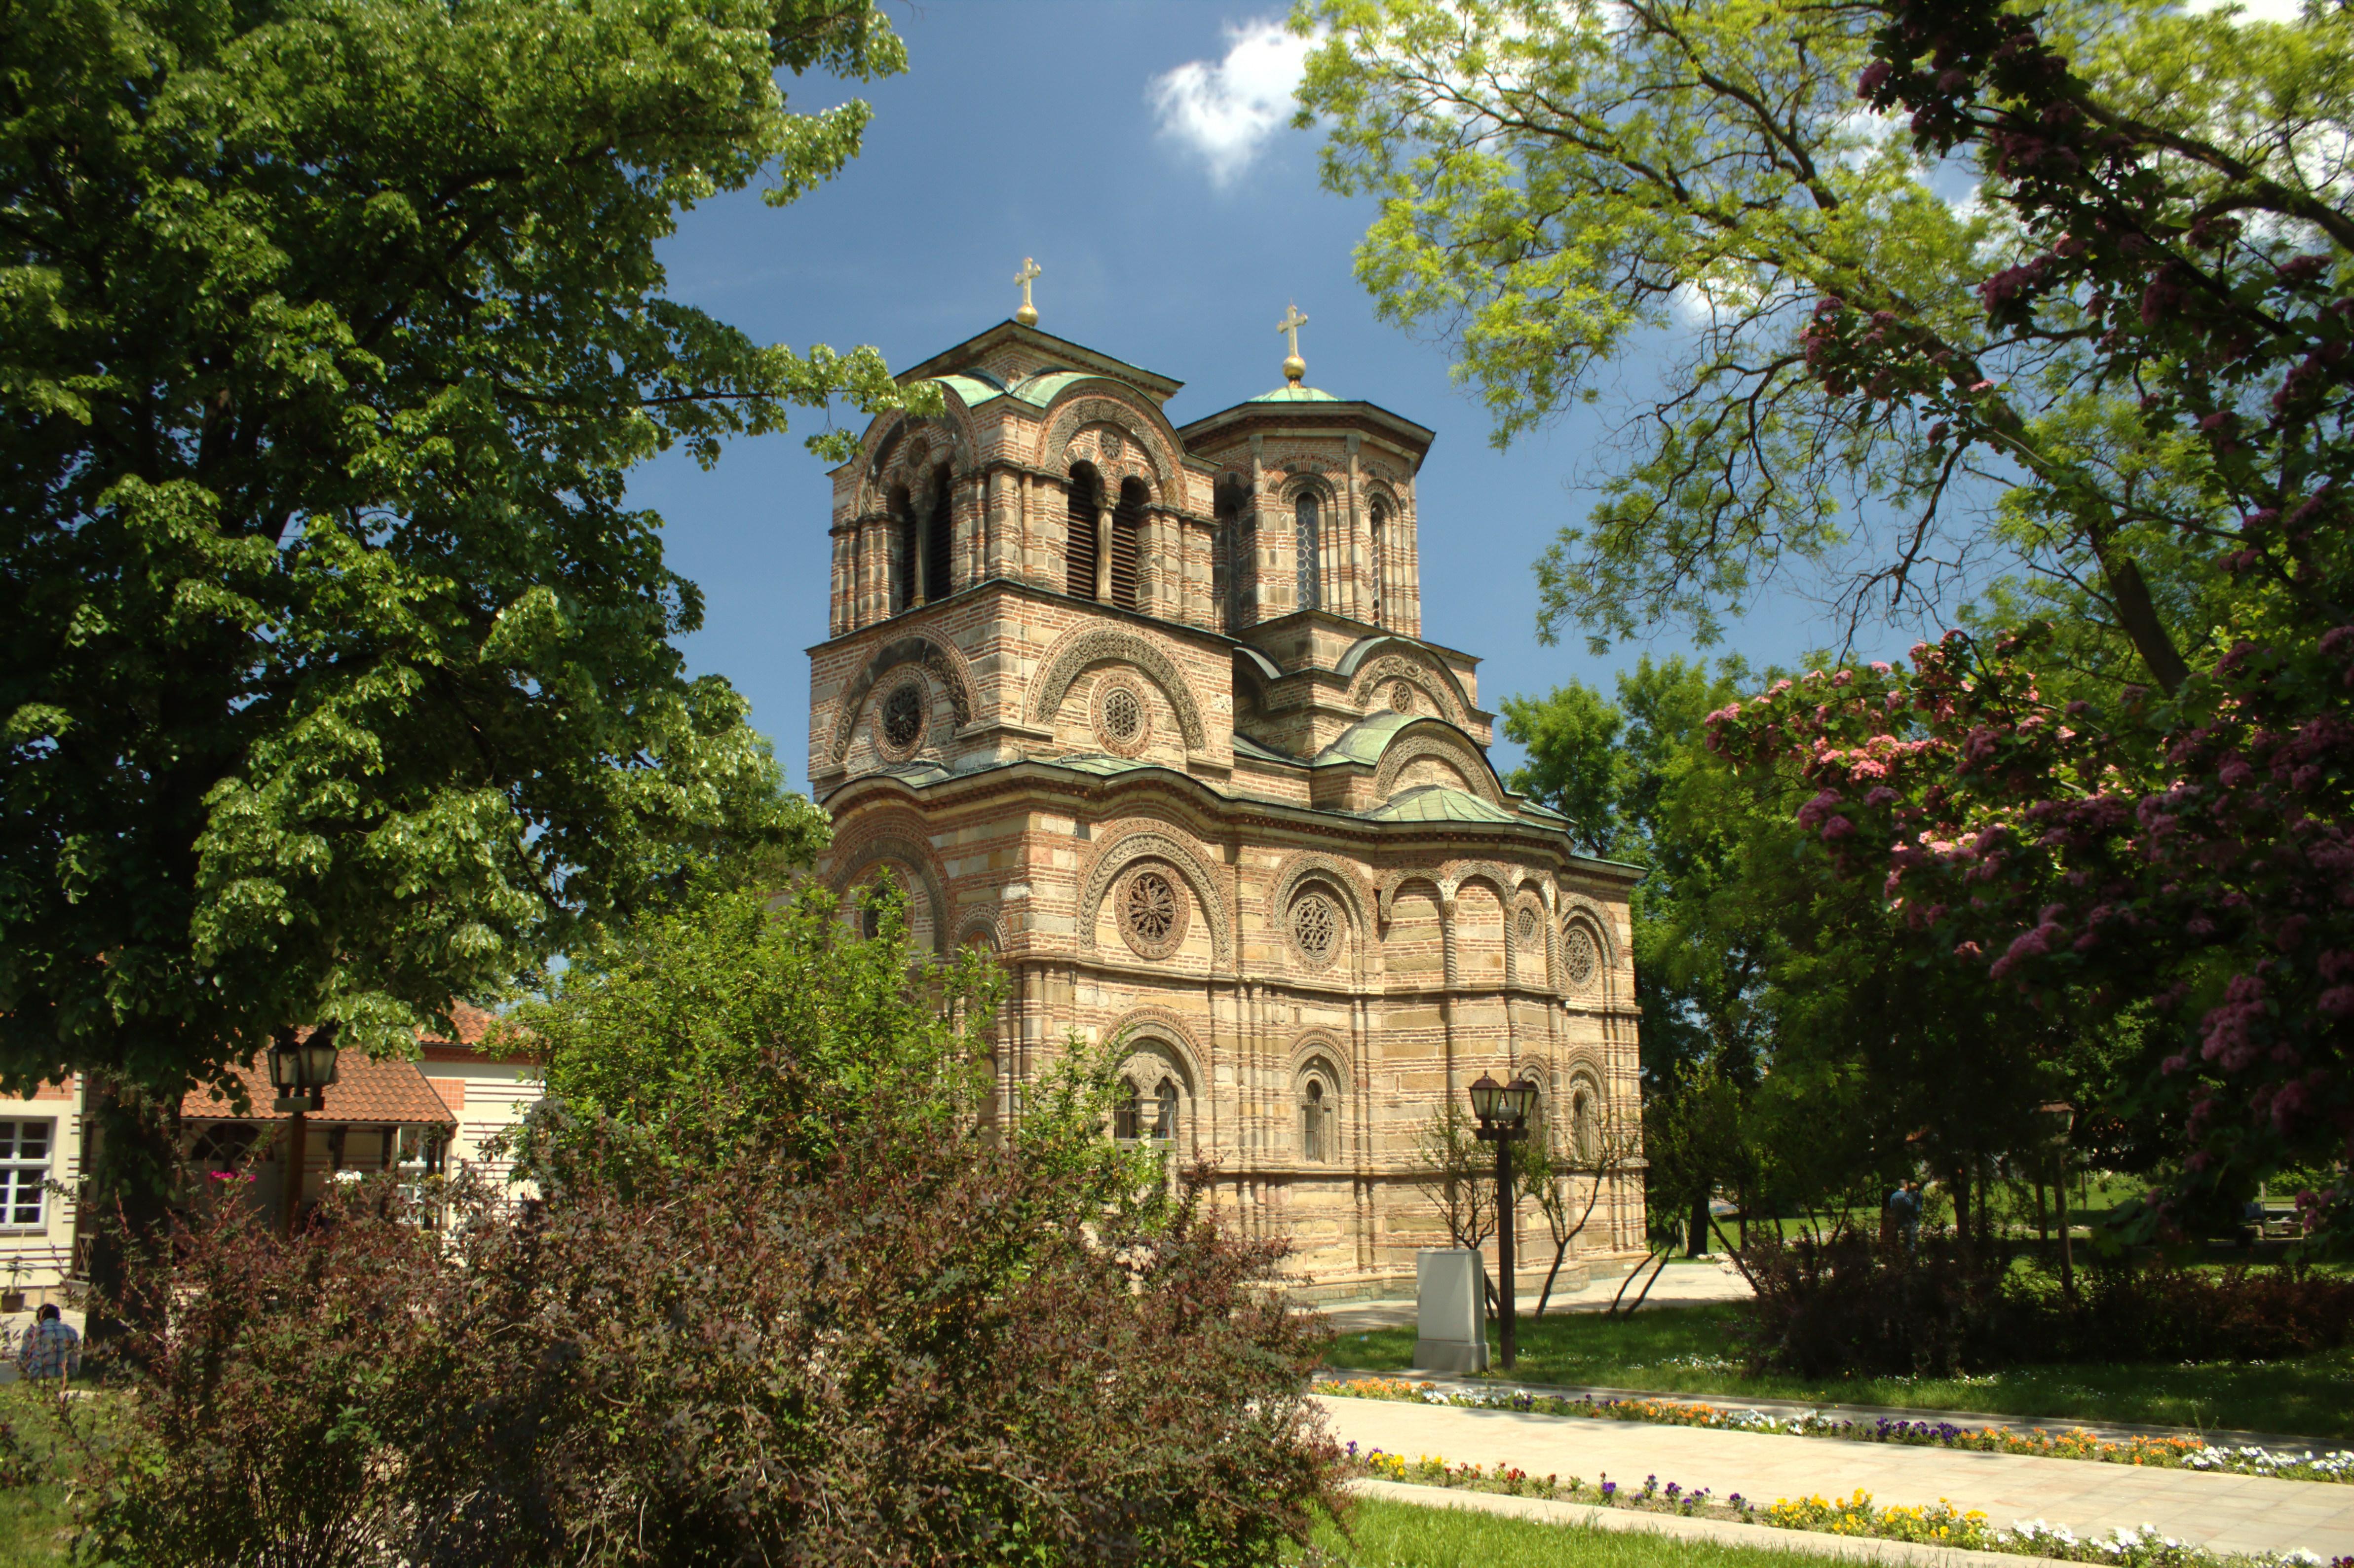 File Kru Evac Kostel Jpg Wikimedia Commons